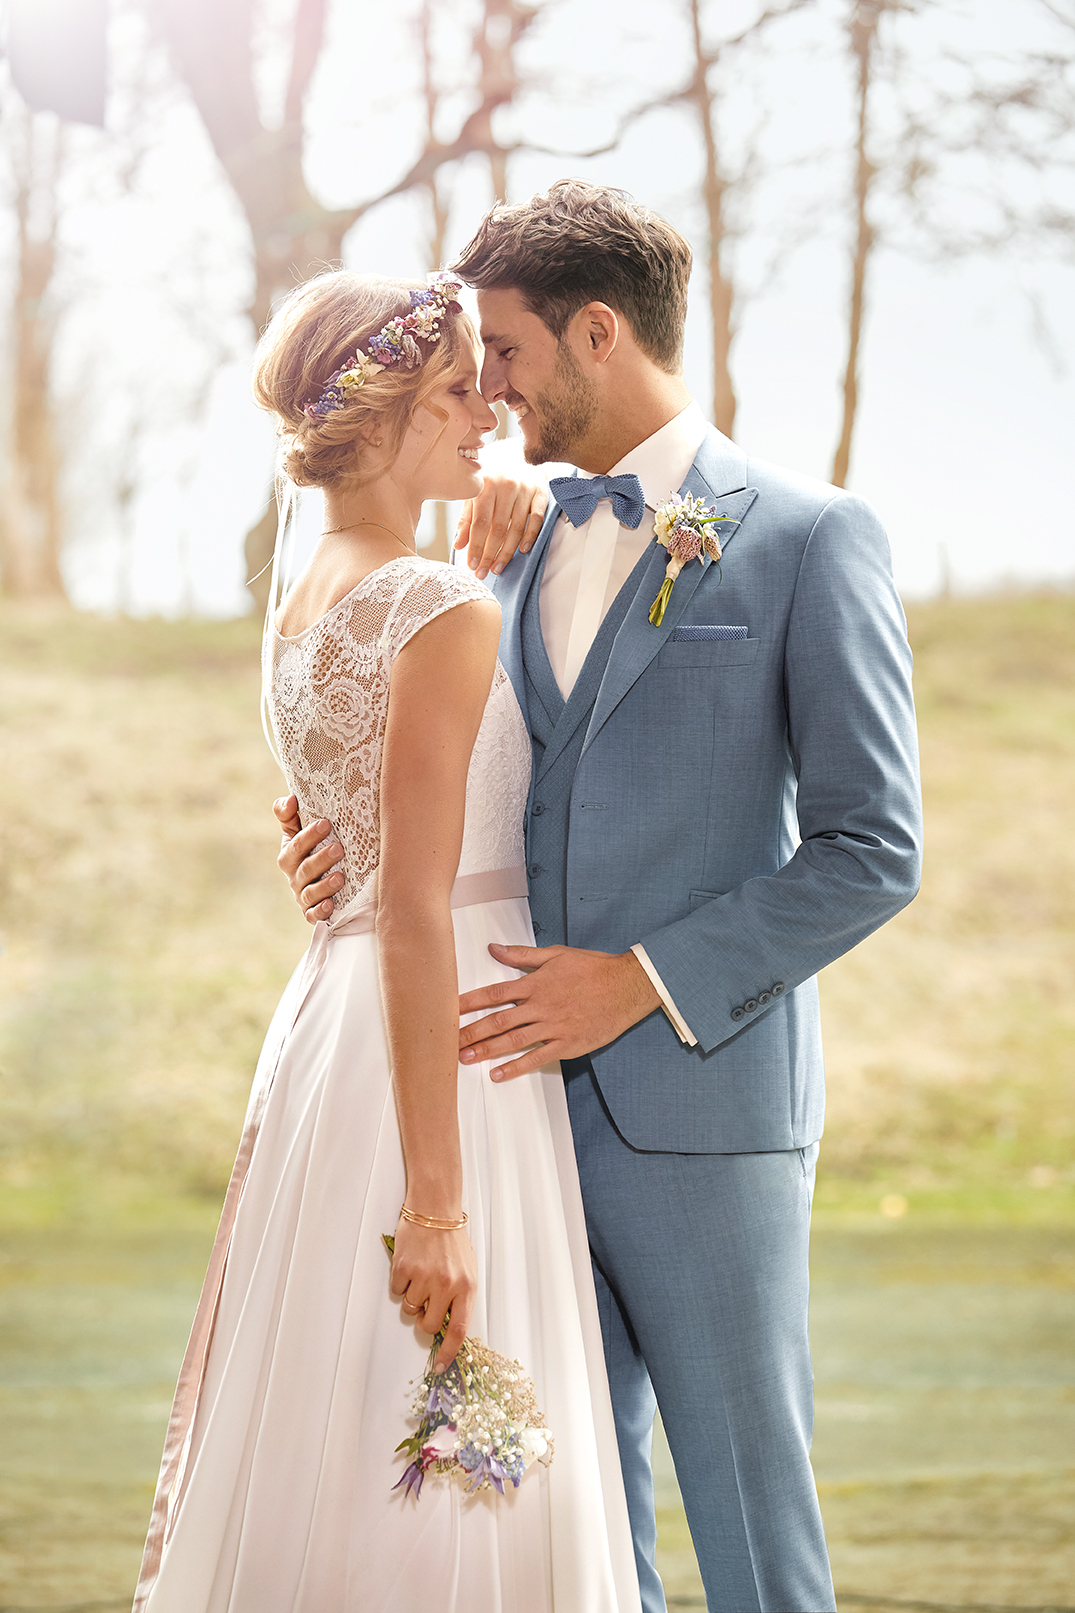 Maßanzug hochzeitskleid anzug blau hochzeit braeutigam casa felicita 1240